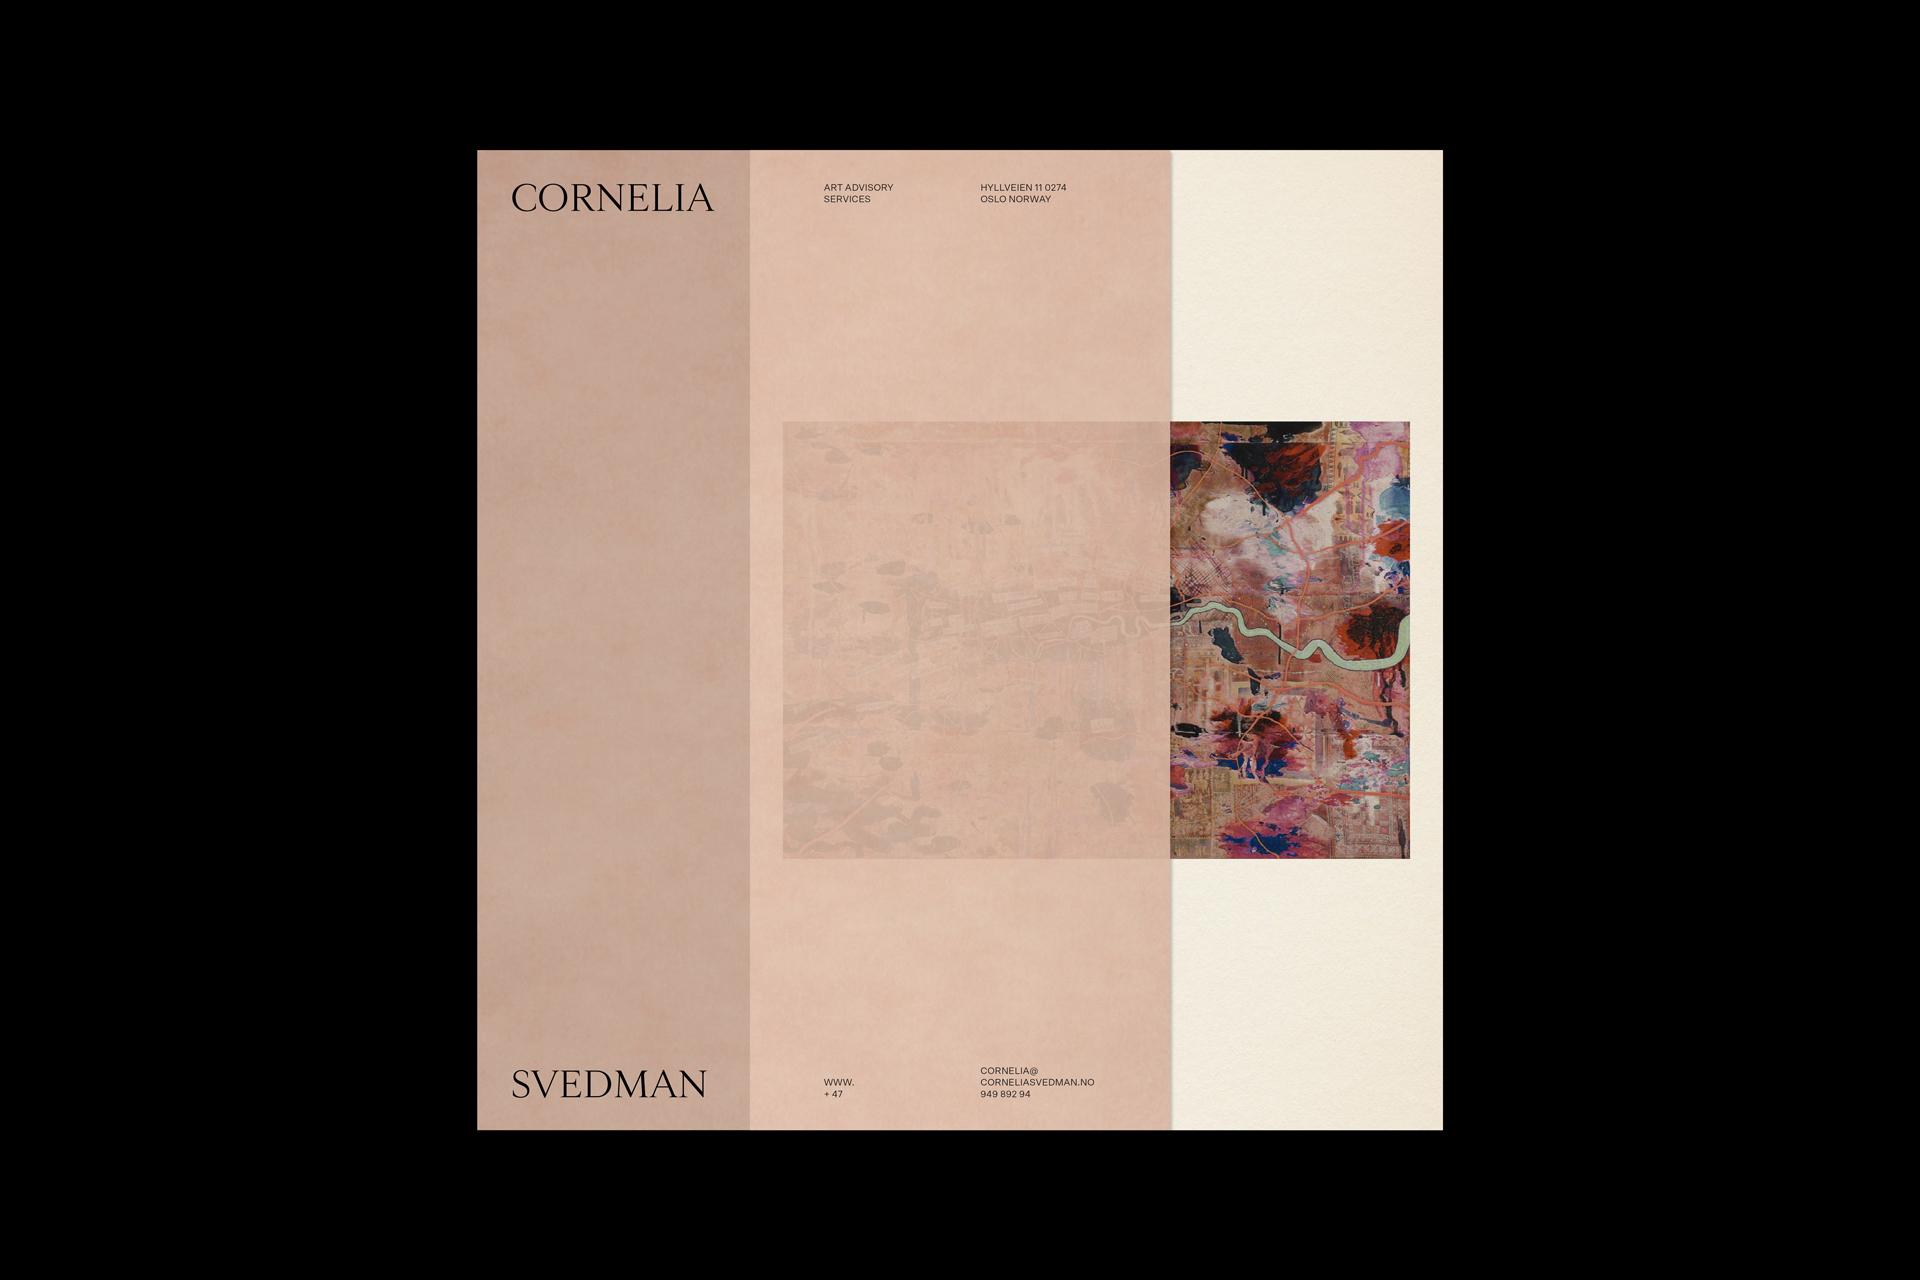 CorneliaSvedman_ArtistCover